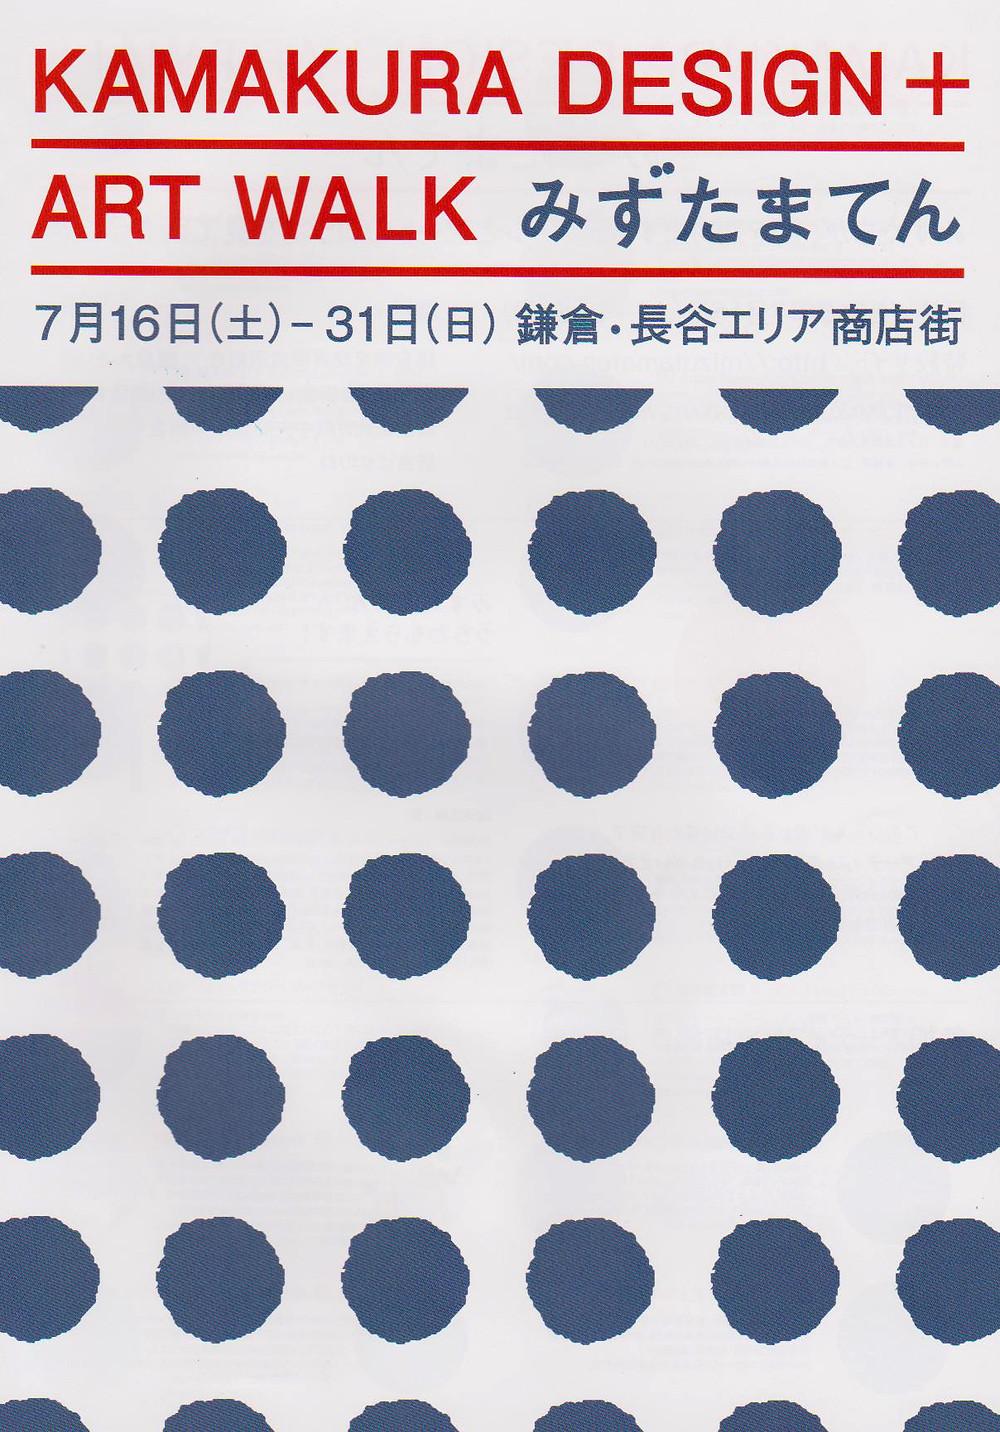 《KAMAKURA DESIGN ART WALKみずたまてん》に 鎌倉四葩『和紙よひらギャラリー』参加してます。フォトグラファーkisimariさんの作品を展示しています。